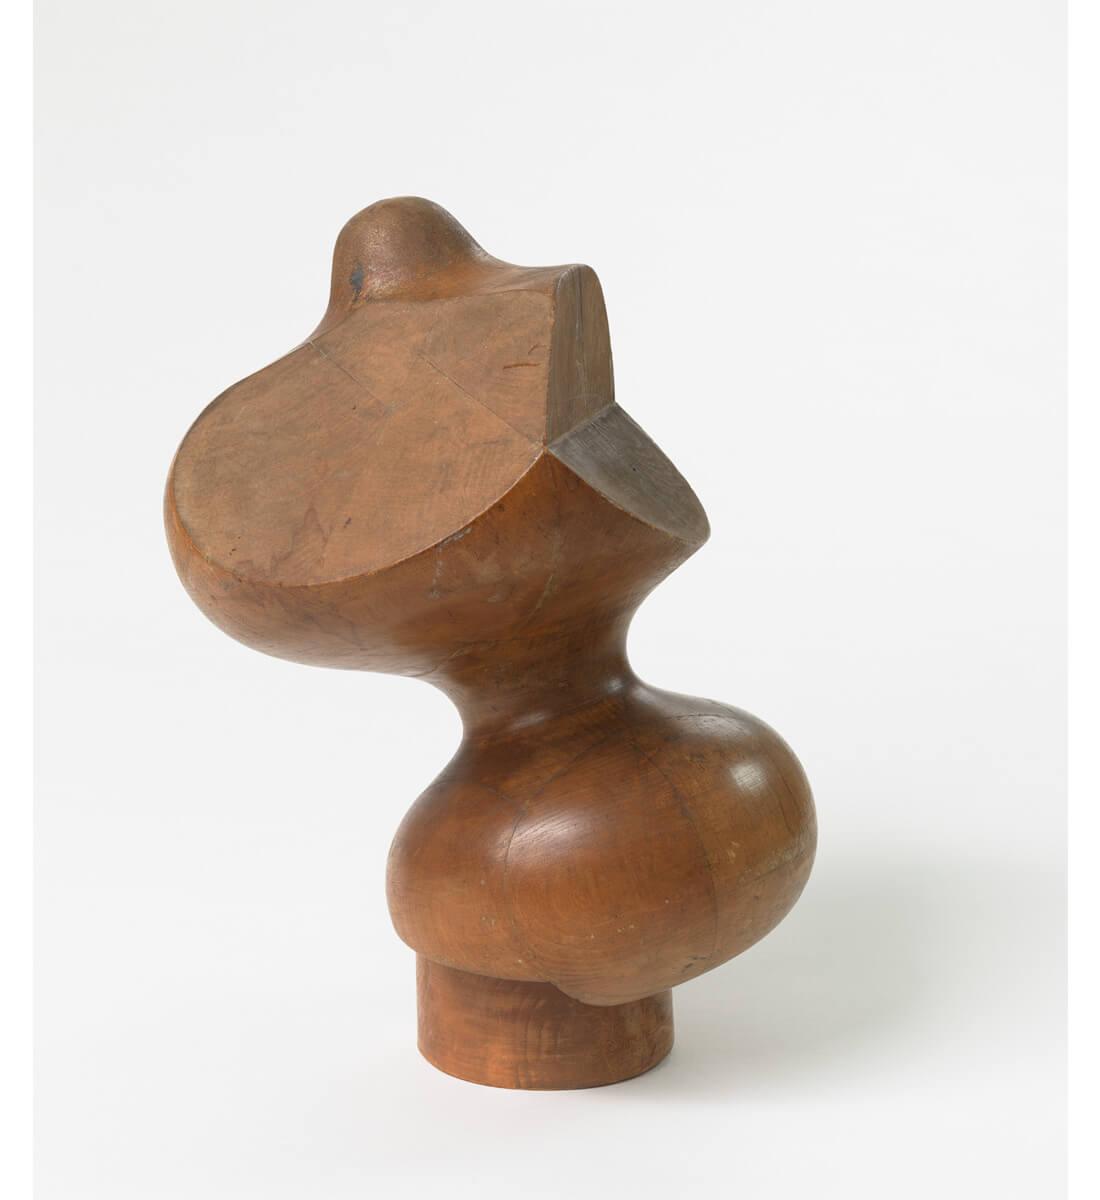 Sophie Taeuber-Arp / <br>Hans Arp <br><br>Sculpture conjugale <br> (Marital Sculpture)